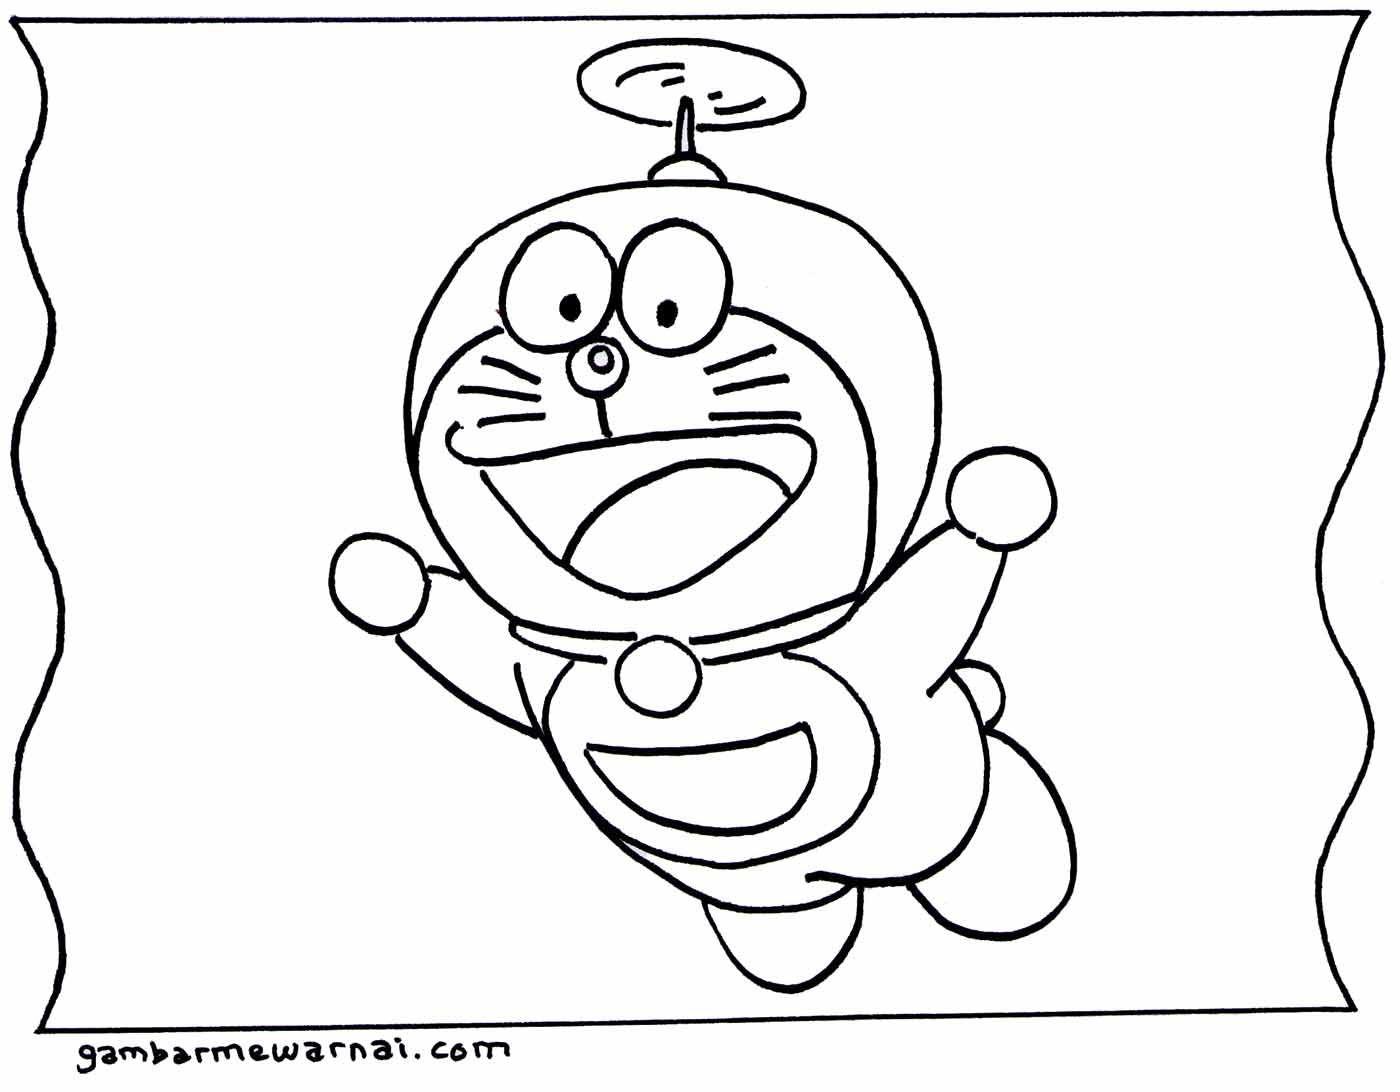 Gambar Mewarnai Doraemon Gambarmewarnai Com Dengan Gambar Buku